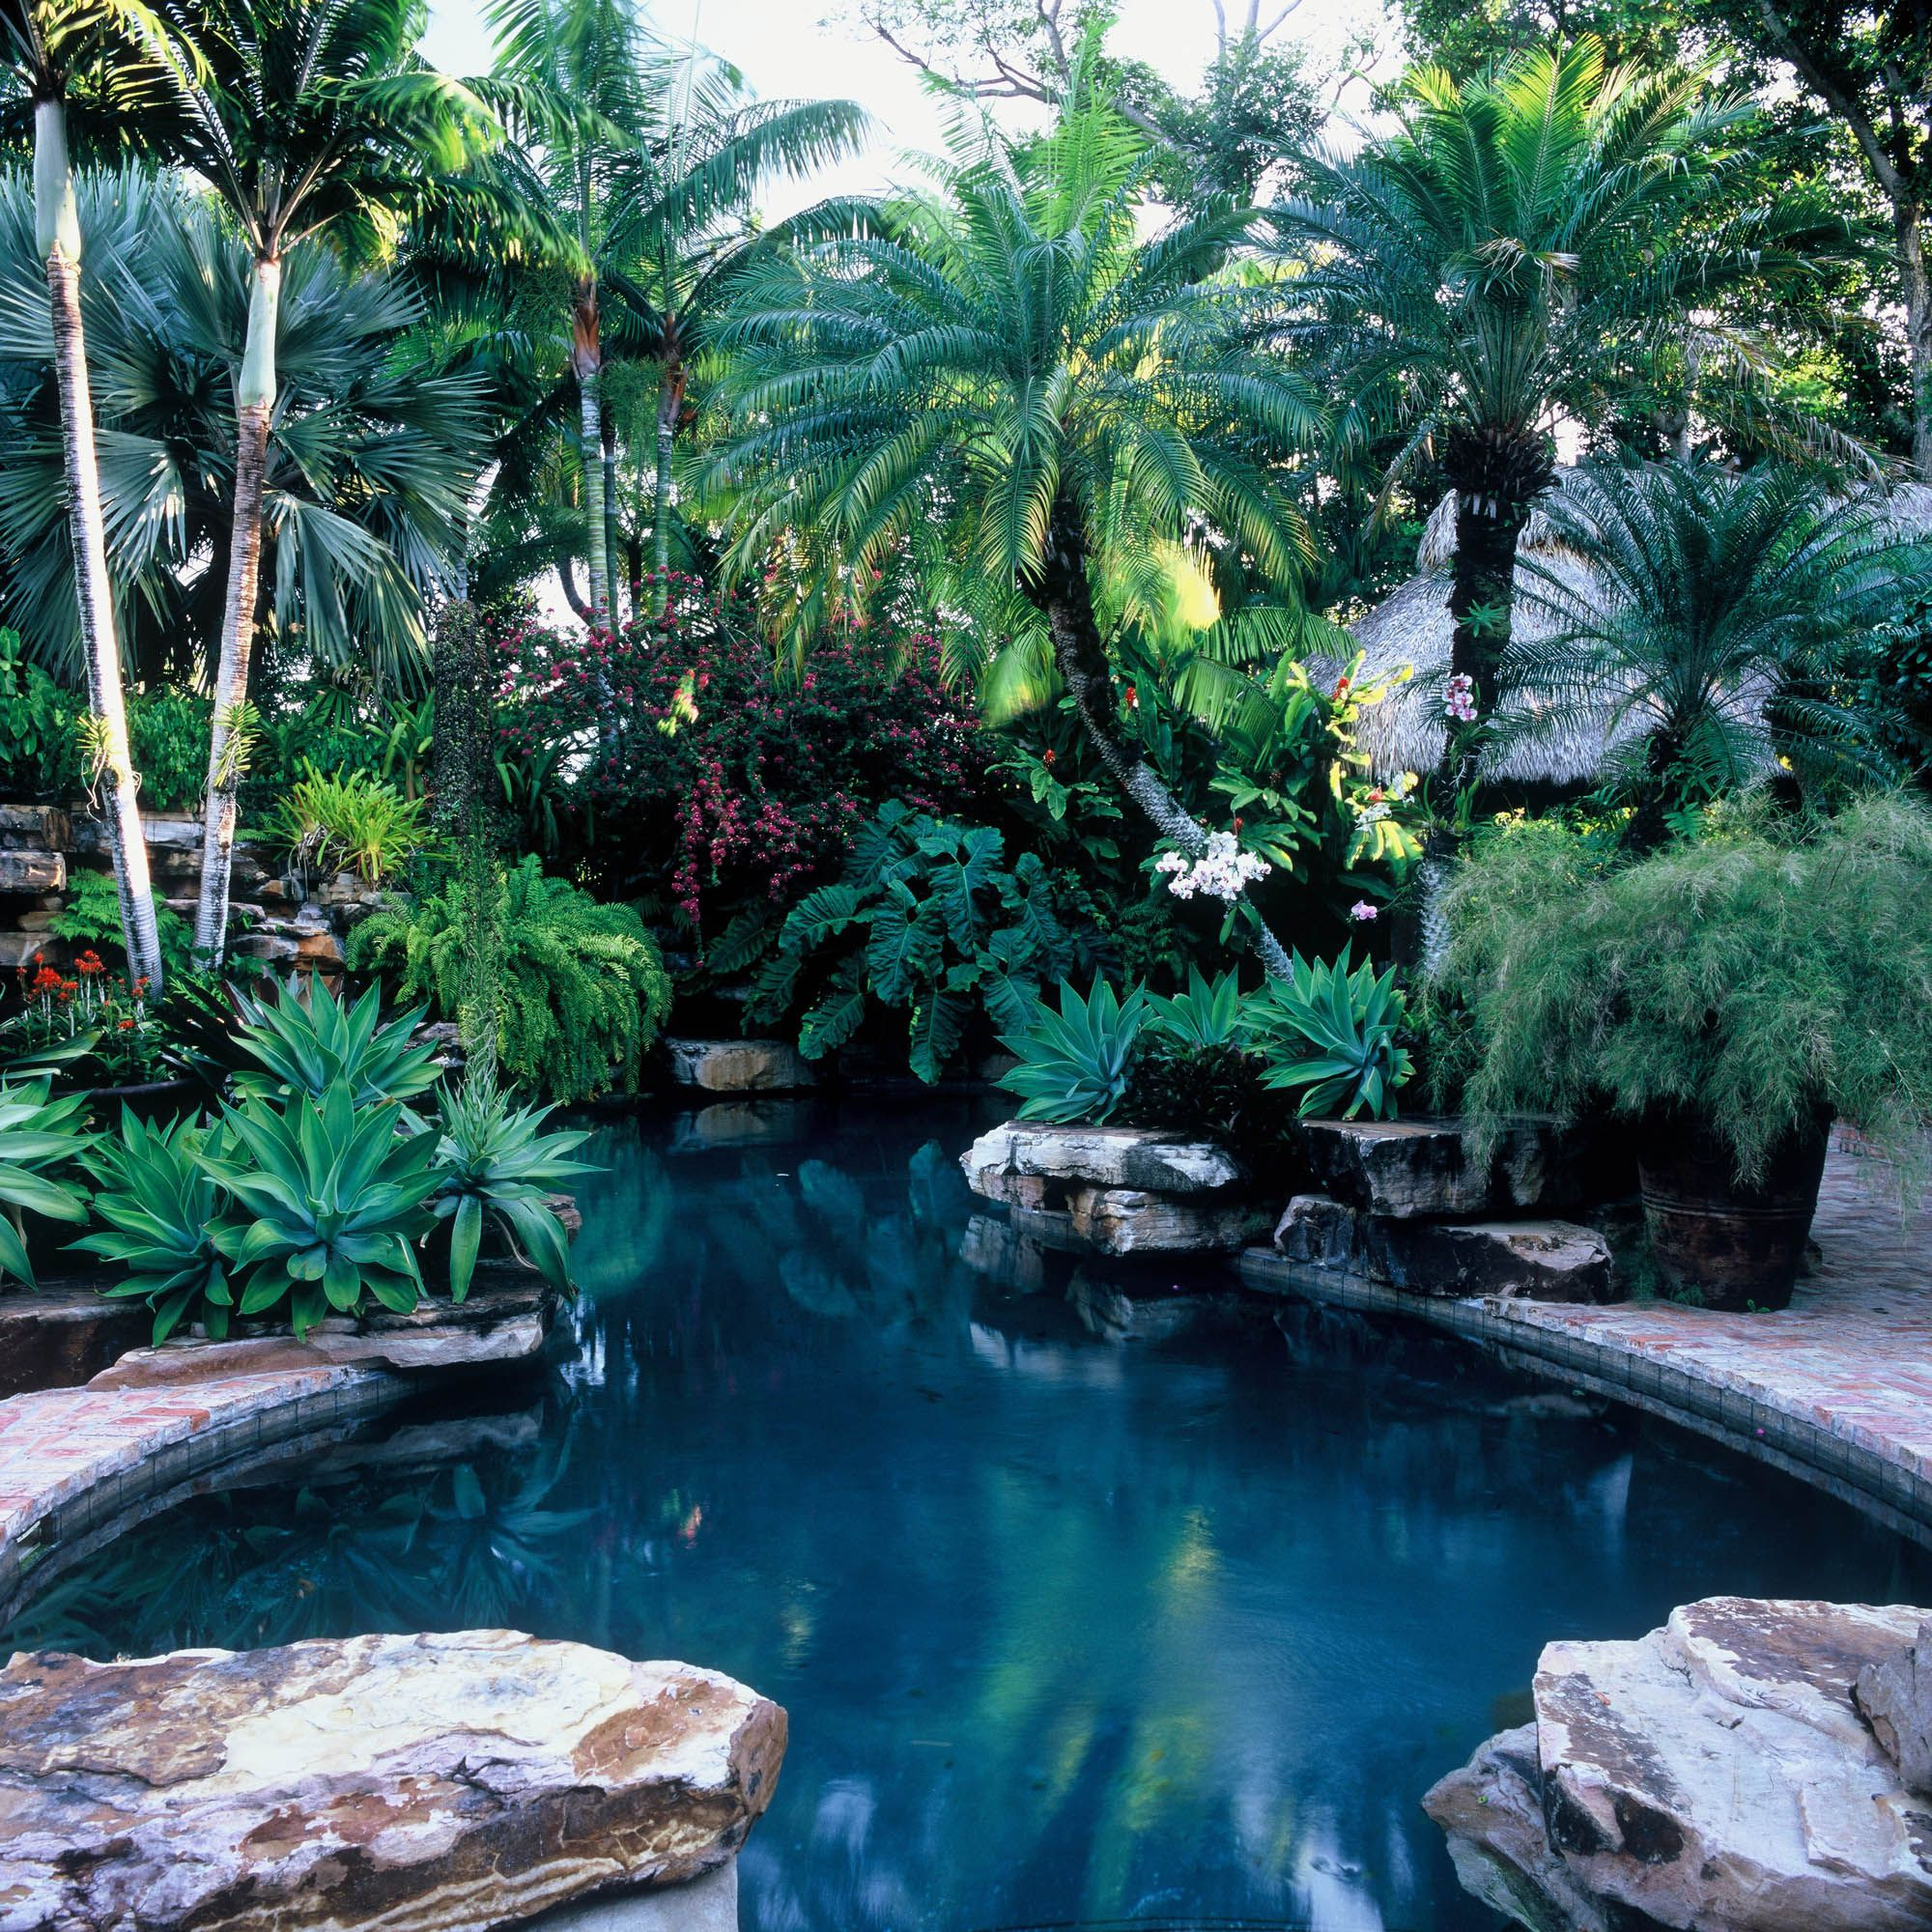 06-Richard Felber Photography-Five Acre Garden #palmtrees #realpalmtrees #buypalmtrees #cool #landscape Realpalmtrees.com